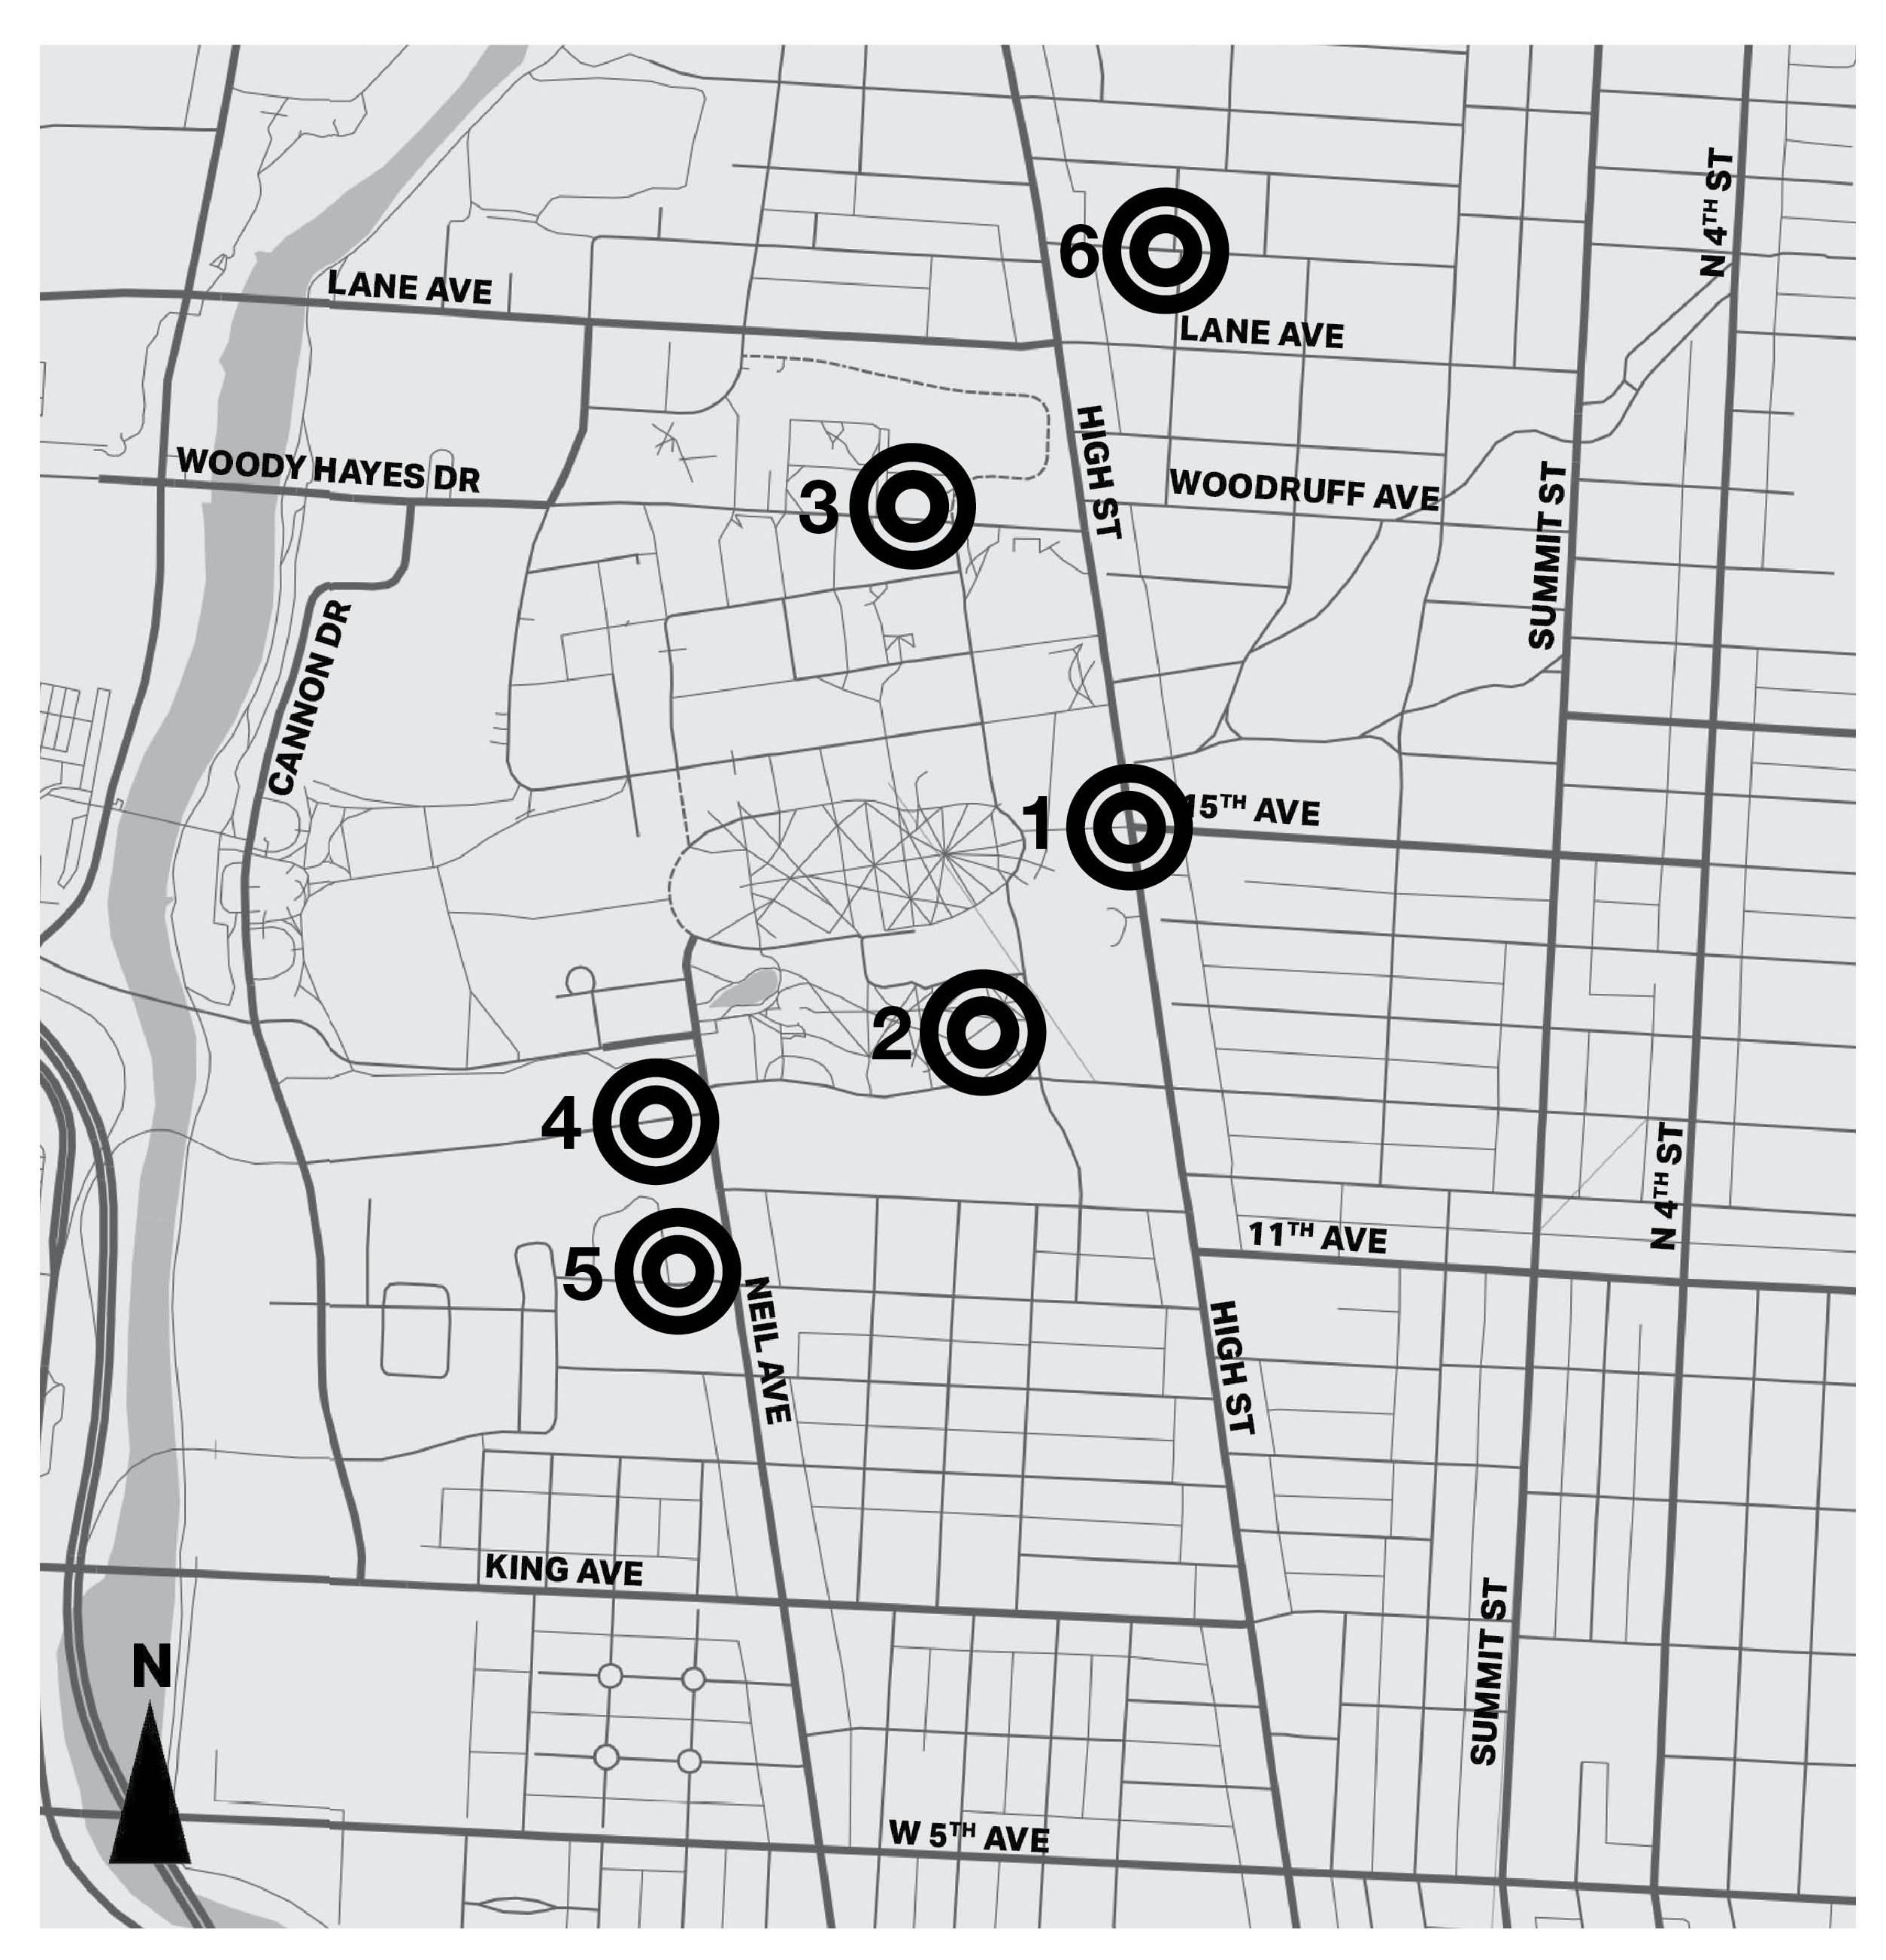 crime map-wk2